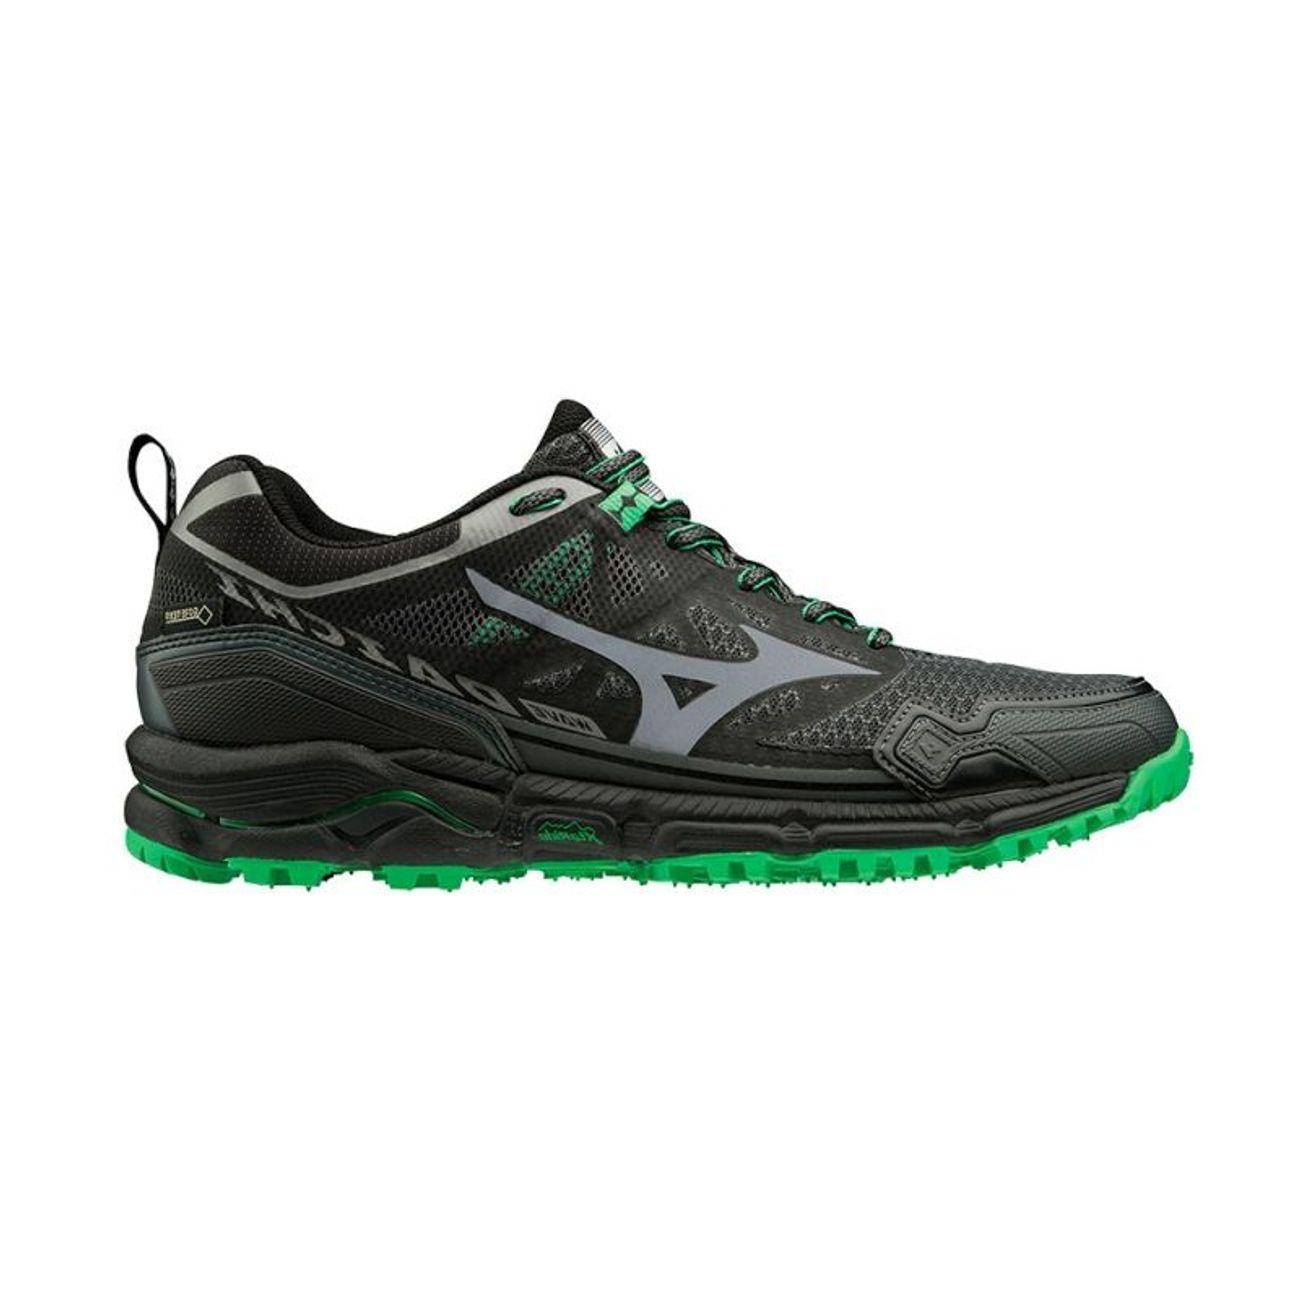 Daichi Chaussures Mizuno Gtx Fitness Wave 4 Homme bf6I7Yyvg